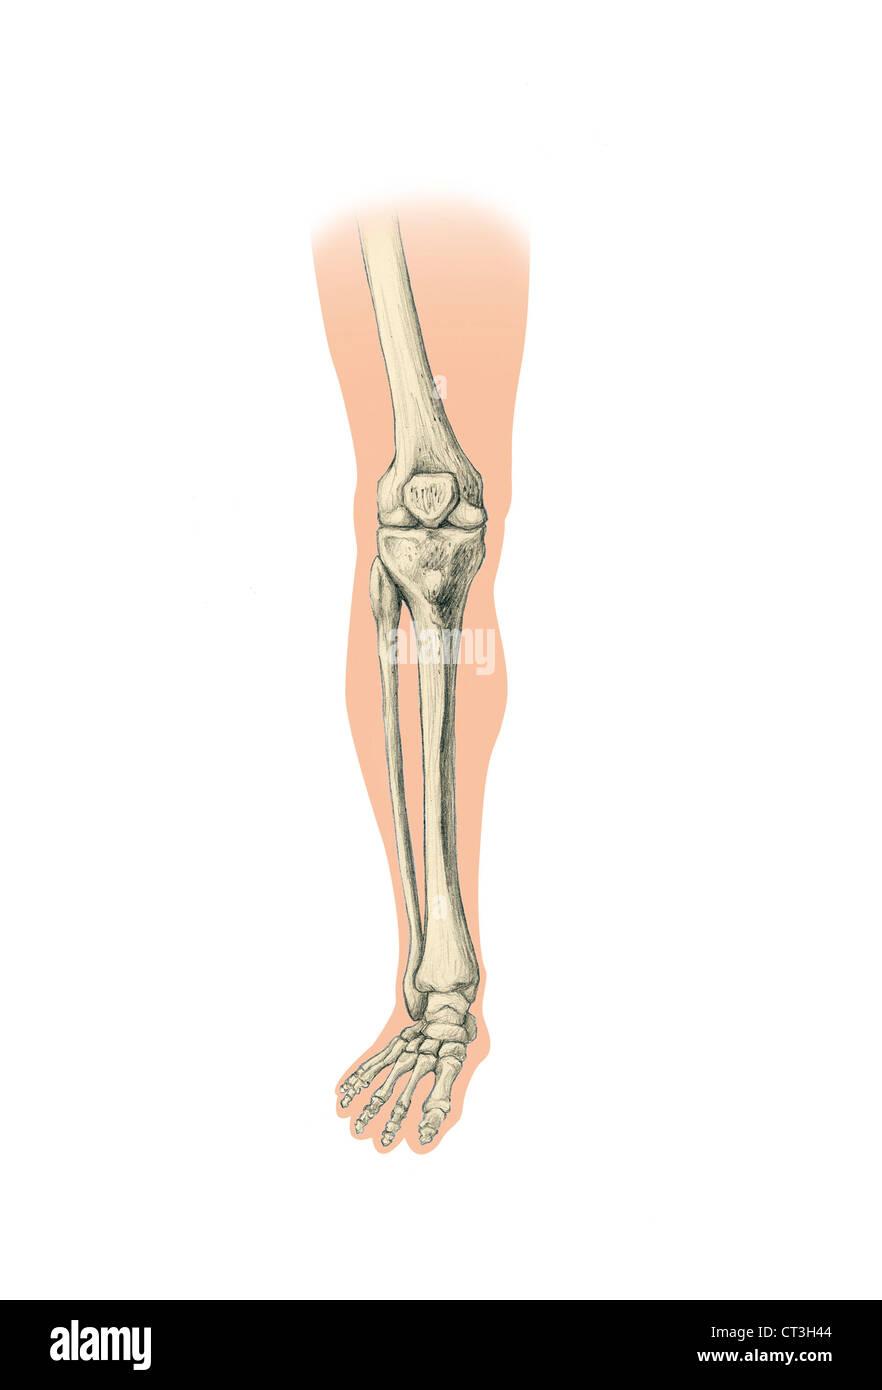 LEG, DRAWING - Stock Image